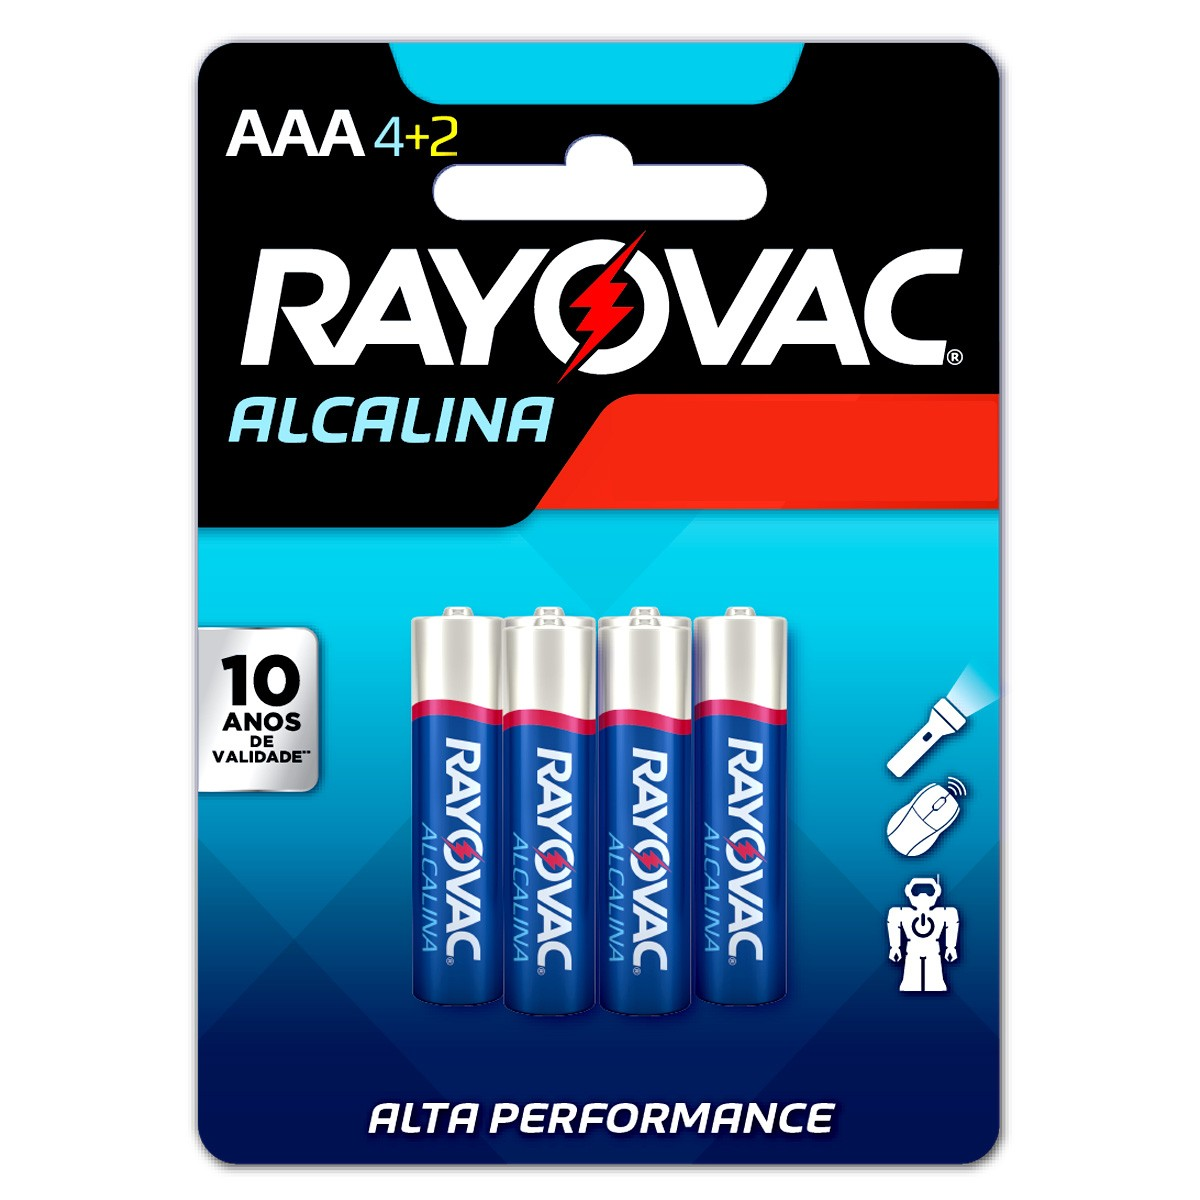 180 Pilhas AAA Alcalina RAYOVAC 30 cartelas